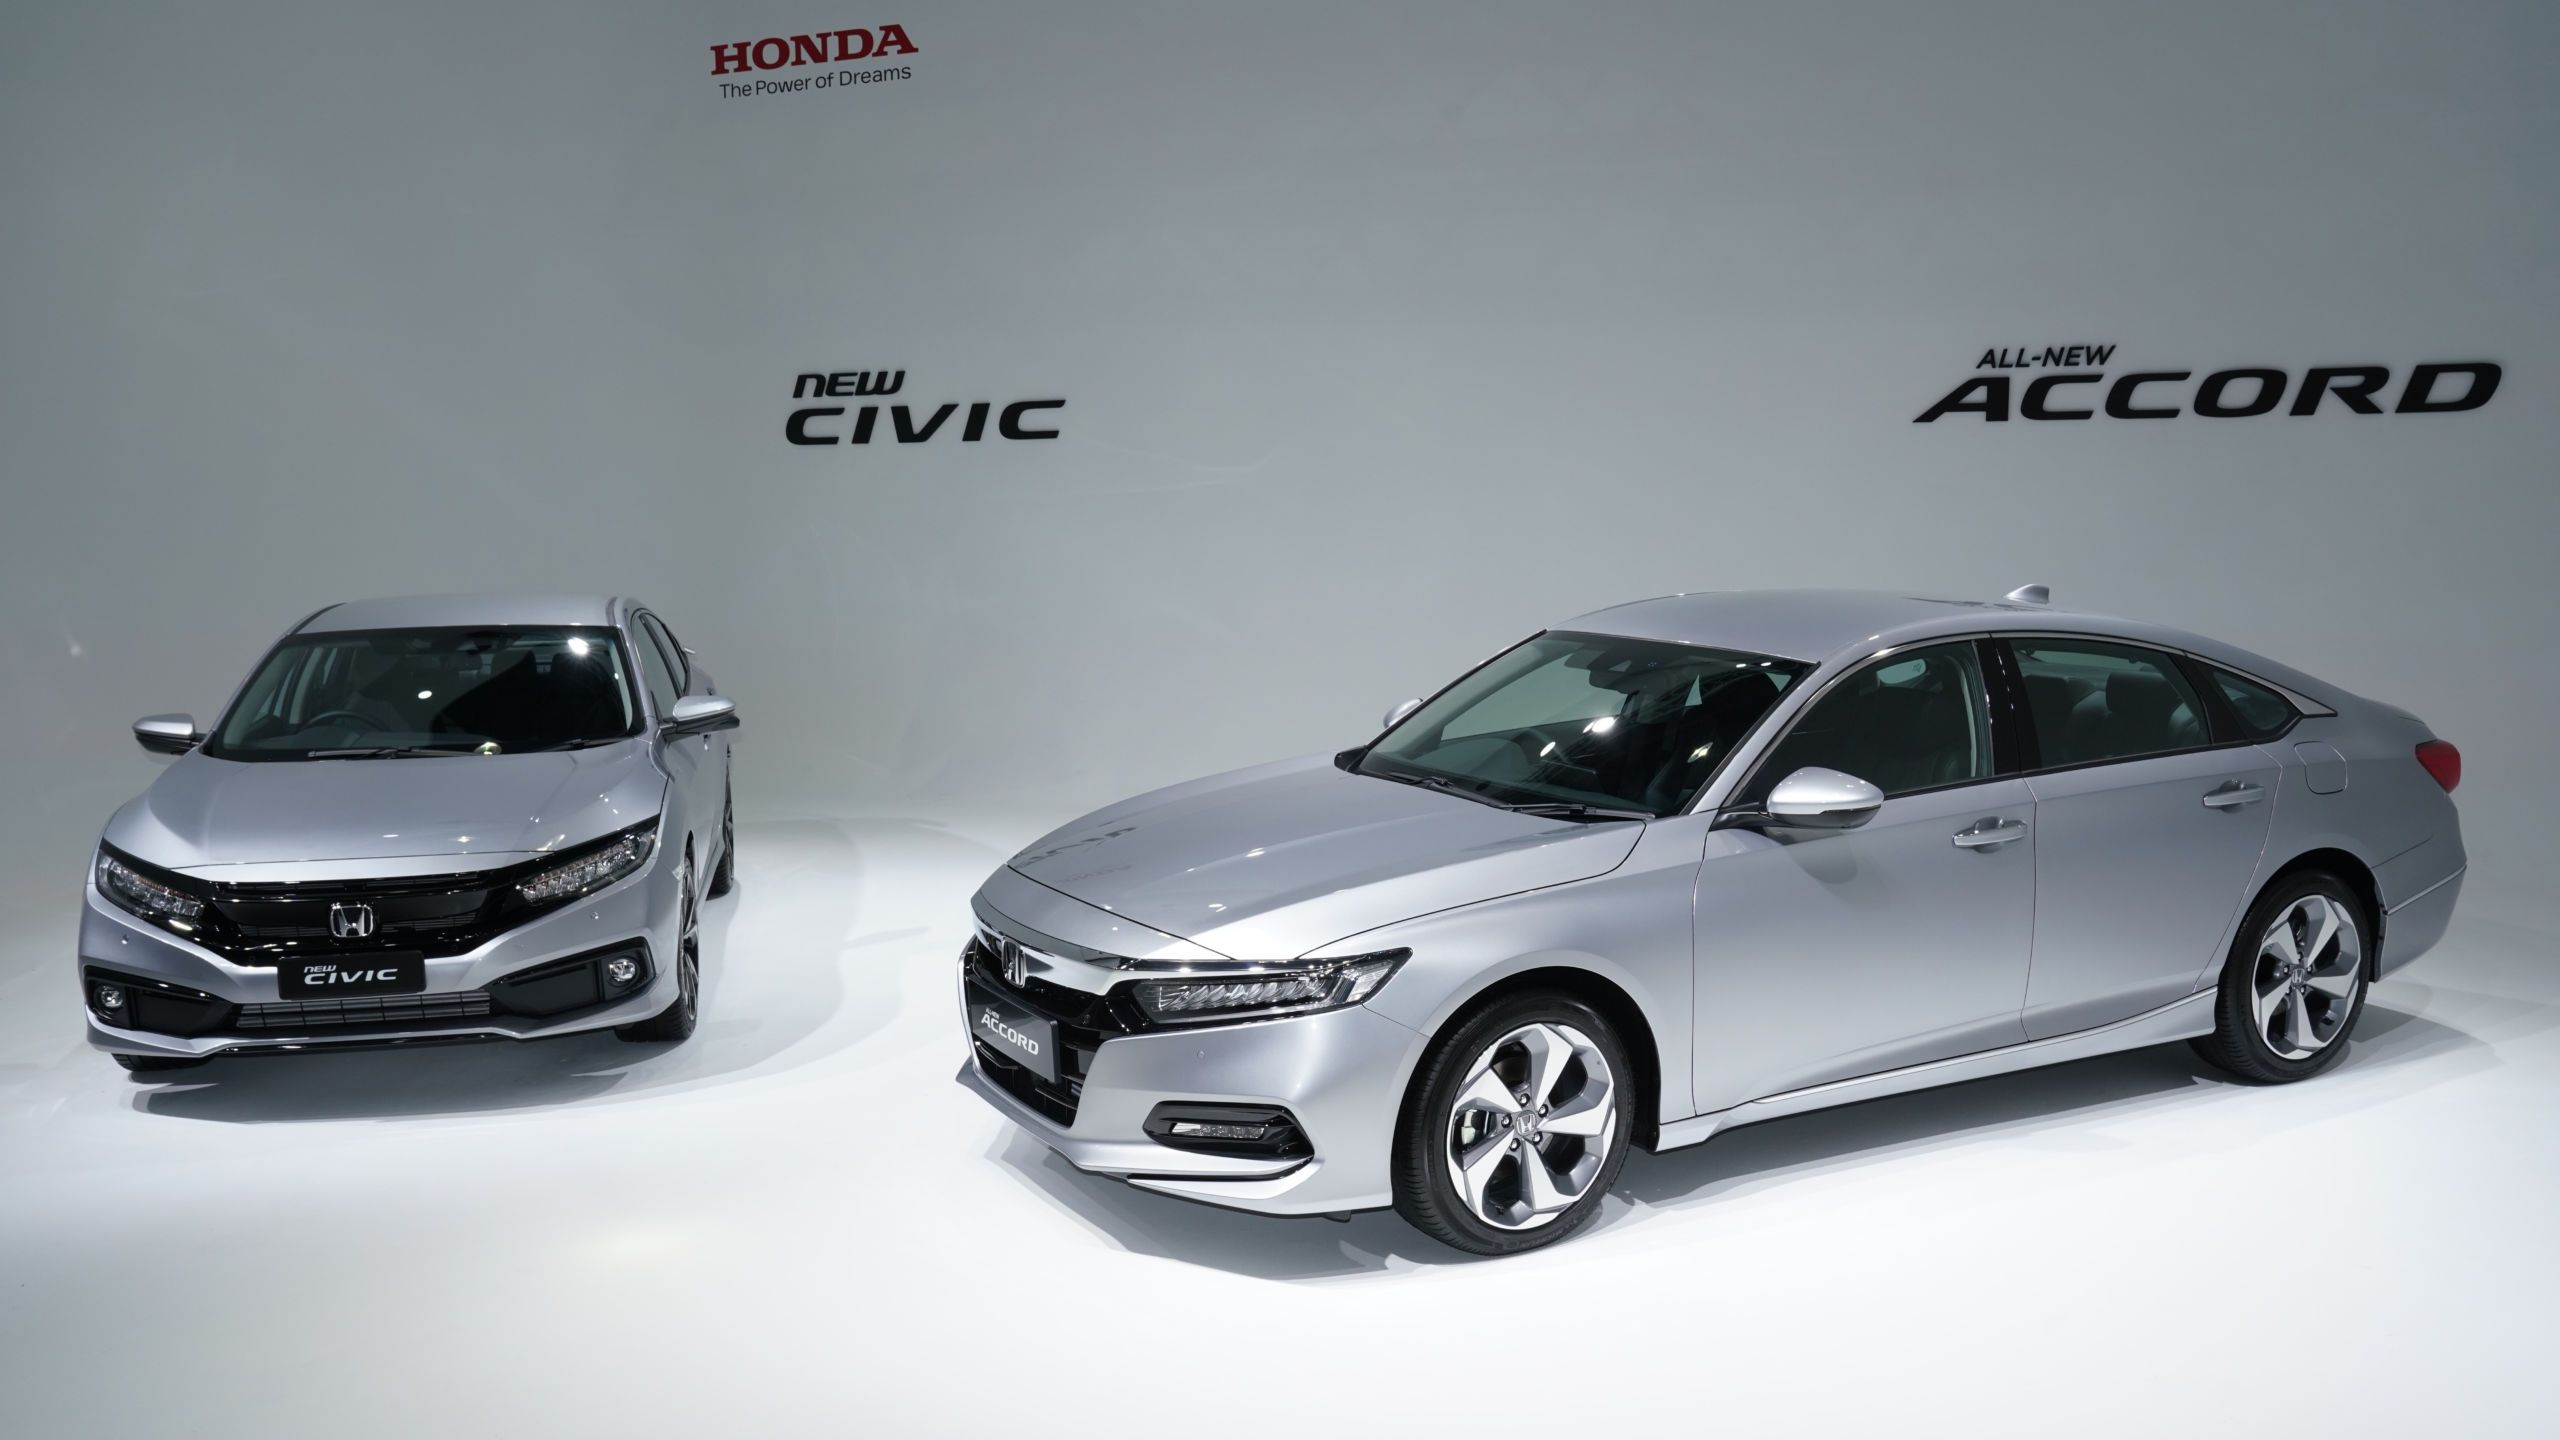 2020 Honda Civic With 1 5l Turbo 1 8l Options Full Honda Sensing Safety Honda Civic National Car Honda S